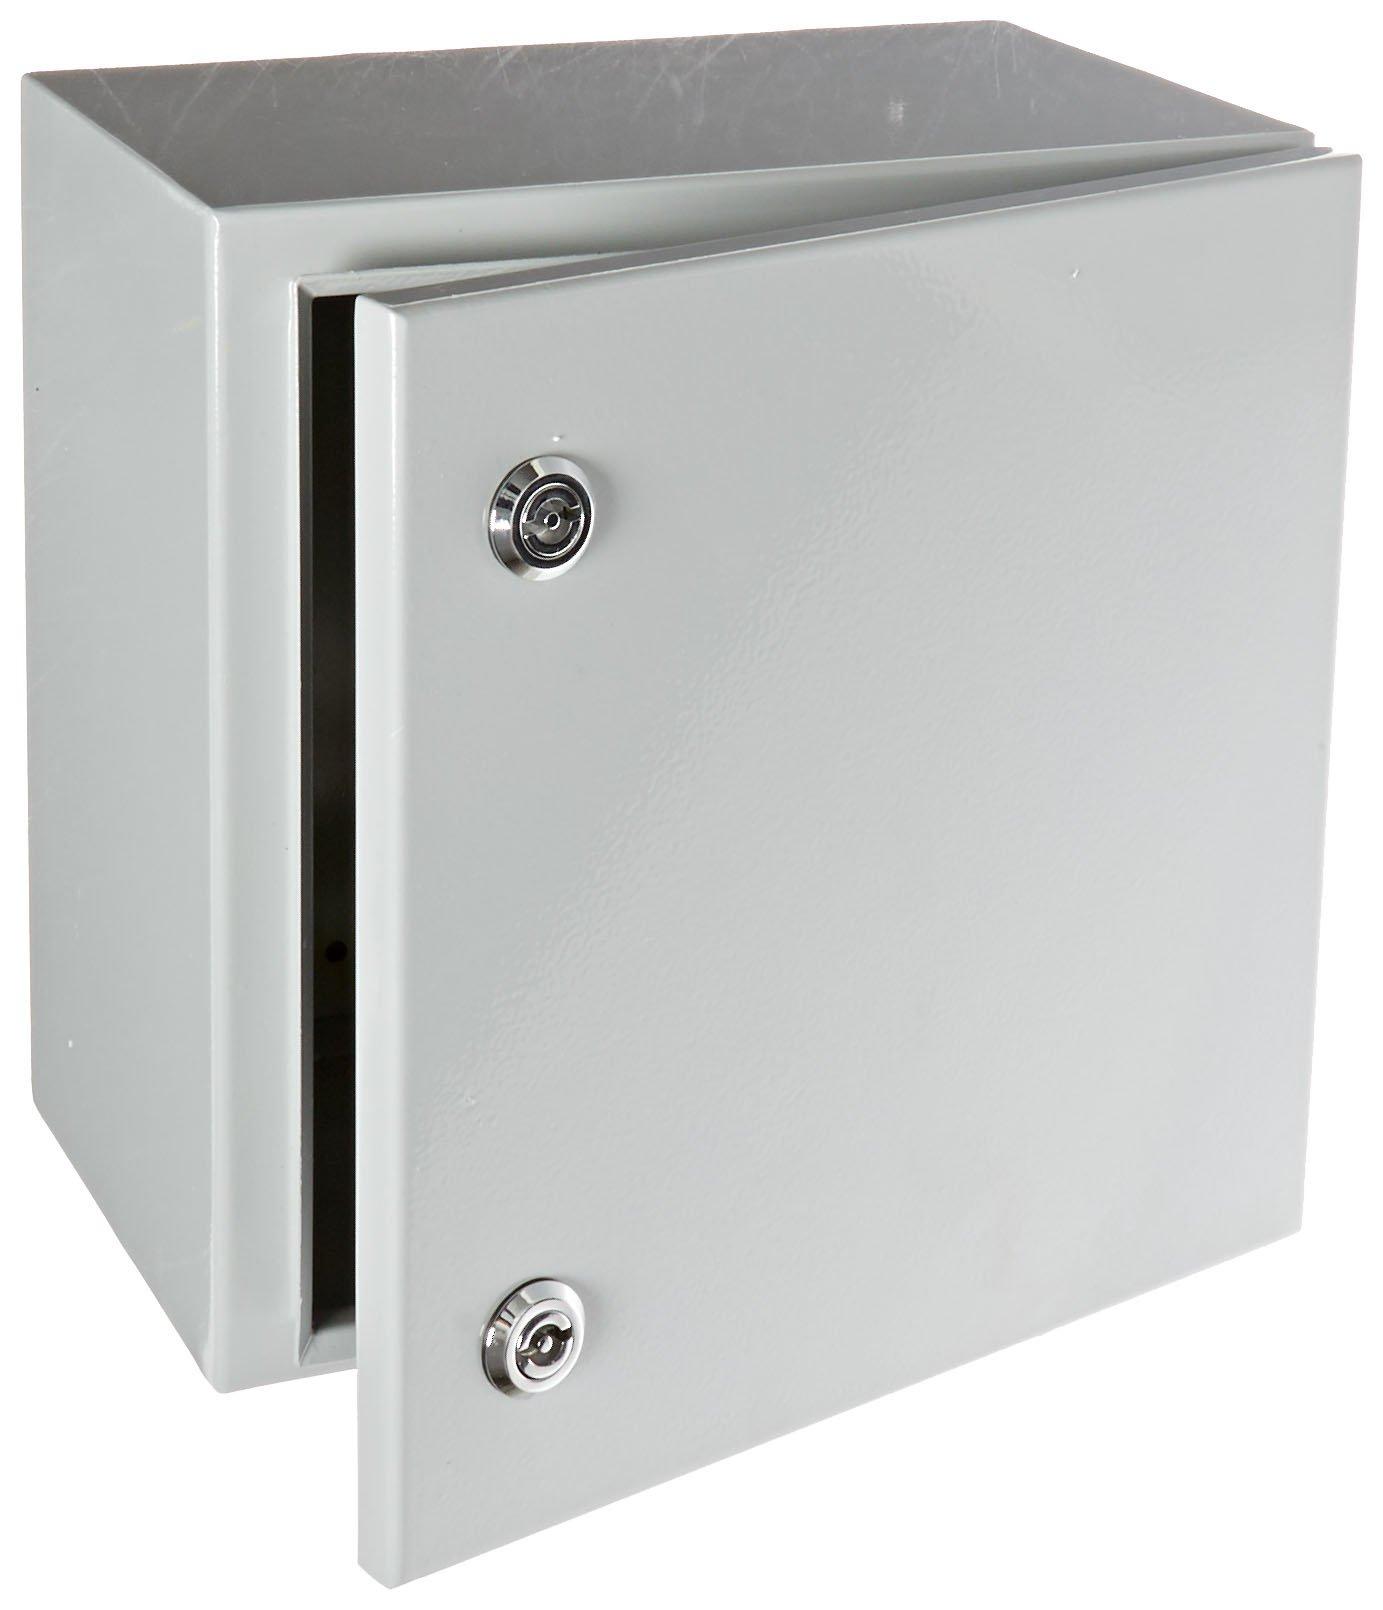 "BUD Industries Series SNB Steel NEMA 4 Sheet Metal Box with Mounting Bracket, 11-51/64"" Width x 11-51/64"" Height x 7-55/64"" Depth, Smooth Gray Finish"